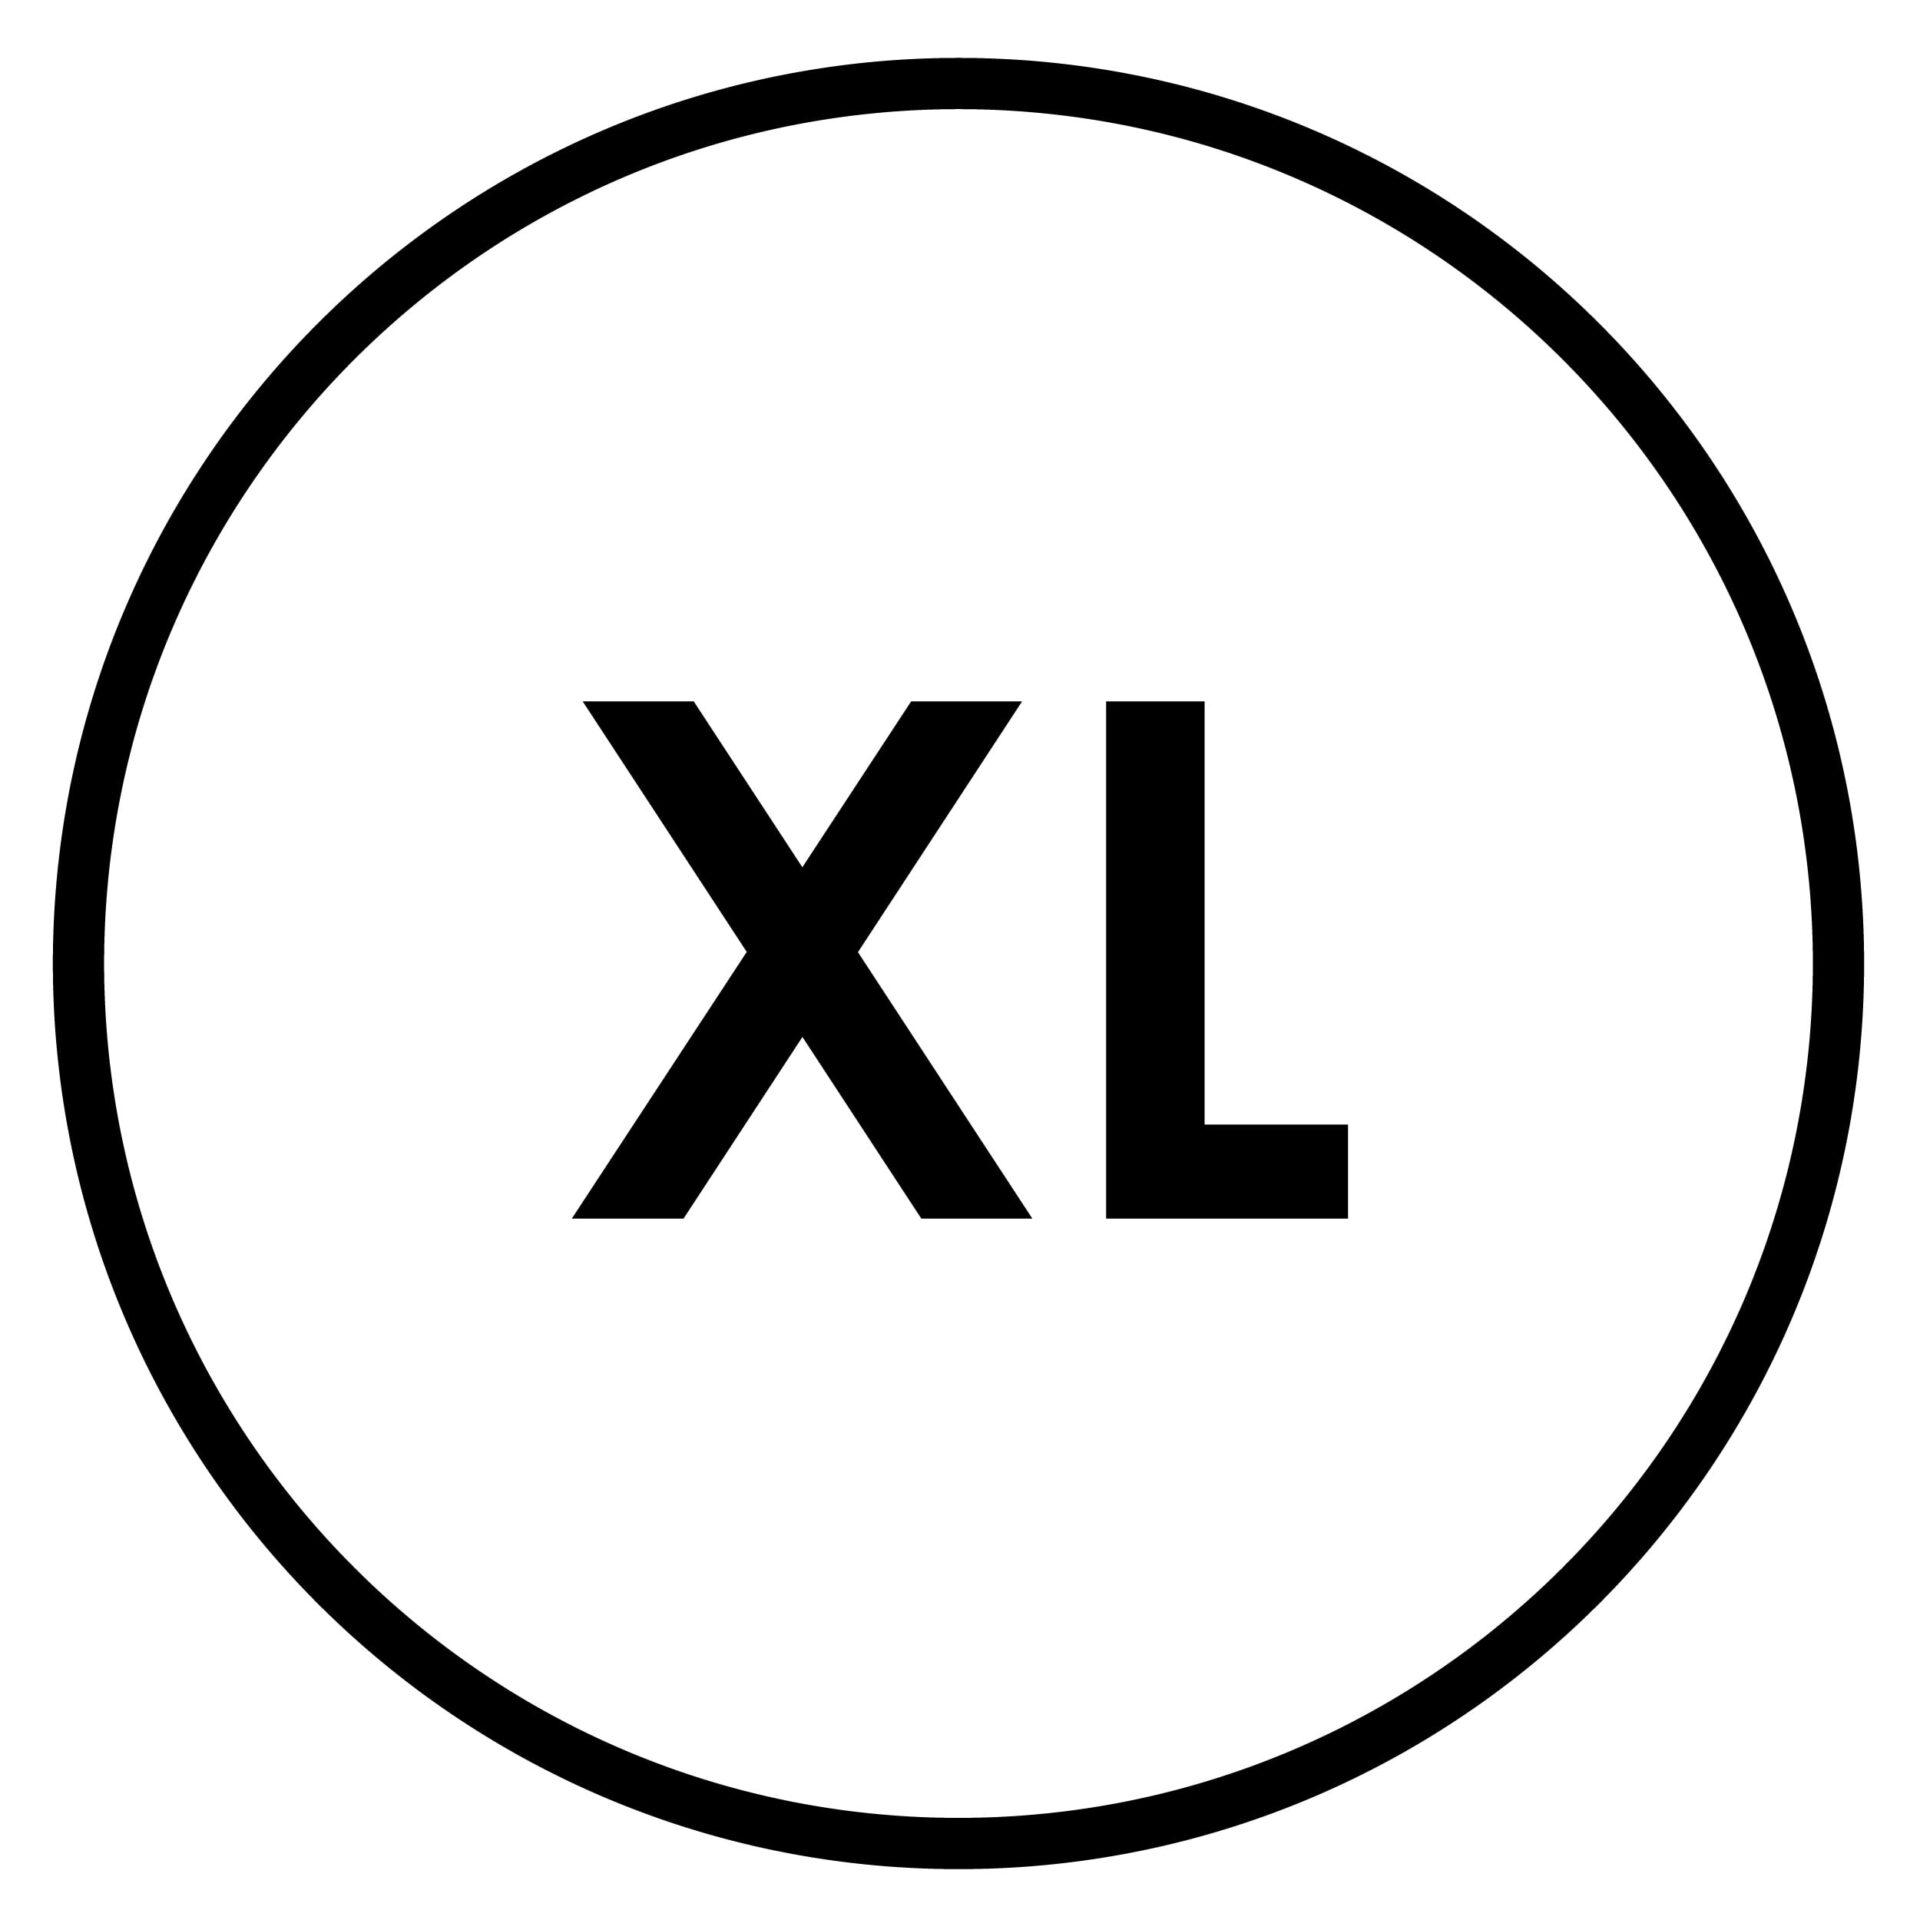 XL-01